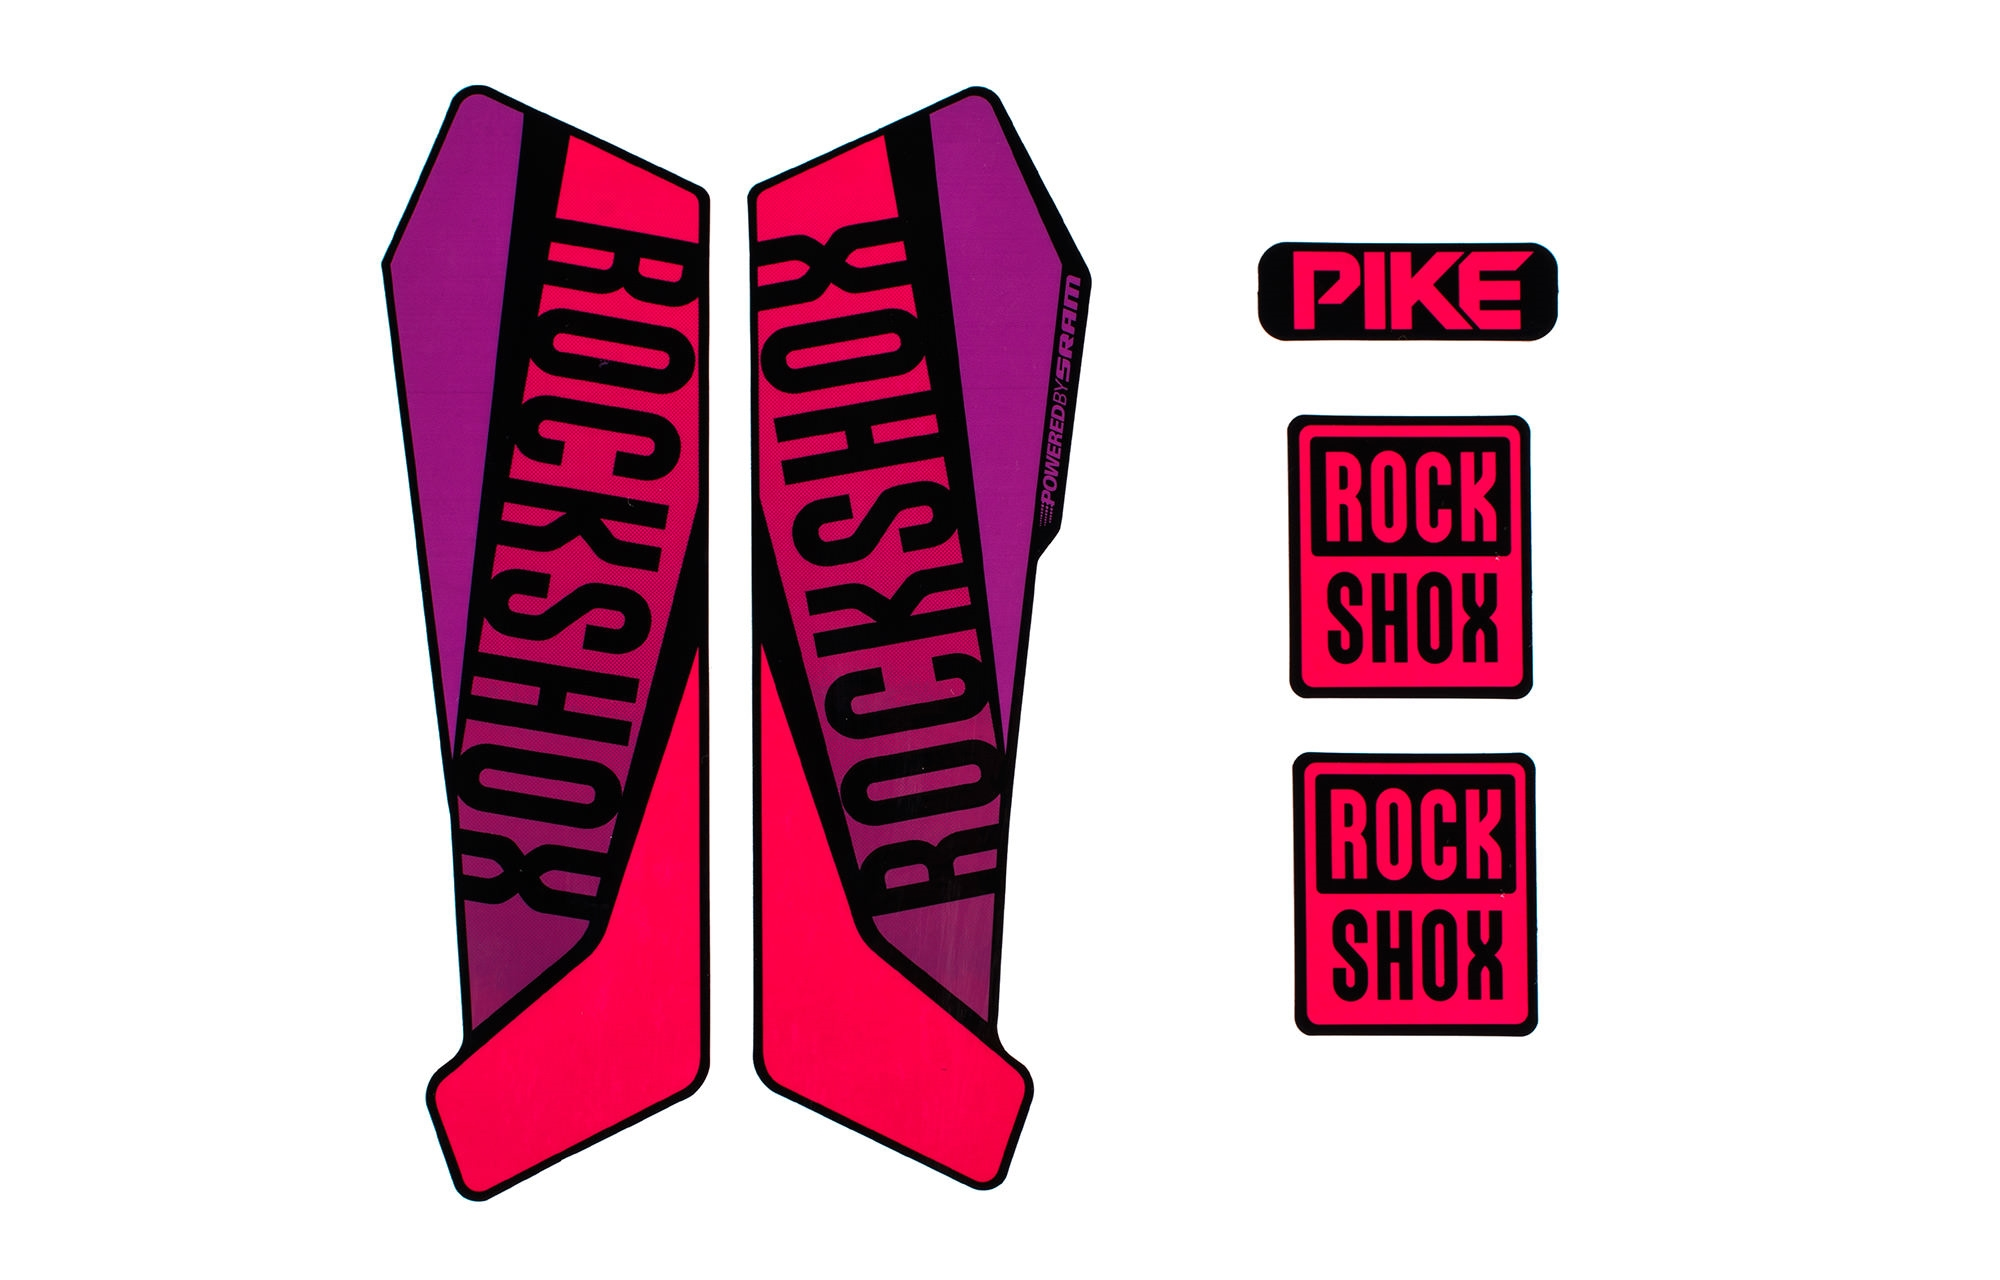 Commencal 2016 Kit Sticker Rock Shox Pike 2016 Purple